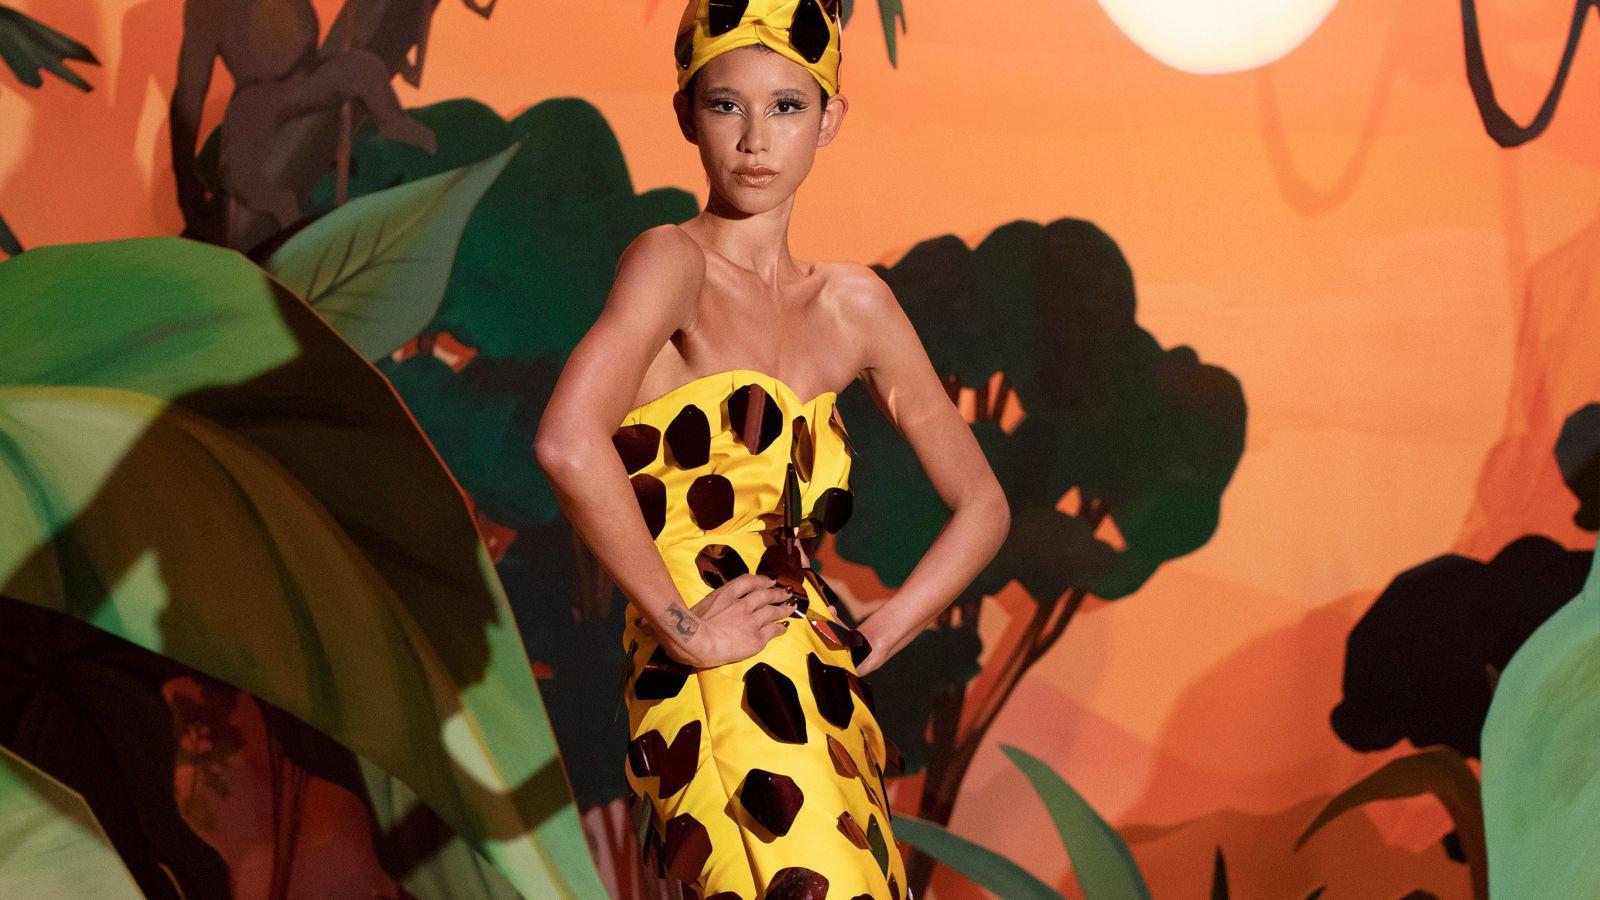 Moschino: Έντονα χρώματα και διάχυτη καλή διάθεση για τη μετά-πανδημία εποχή